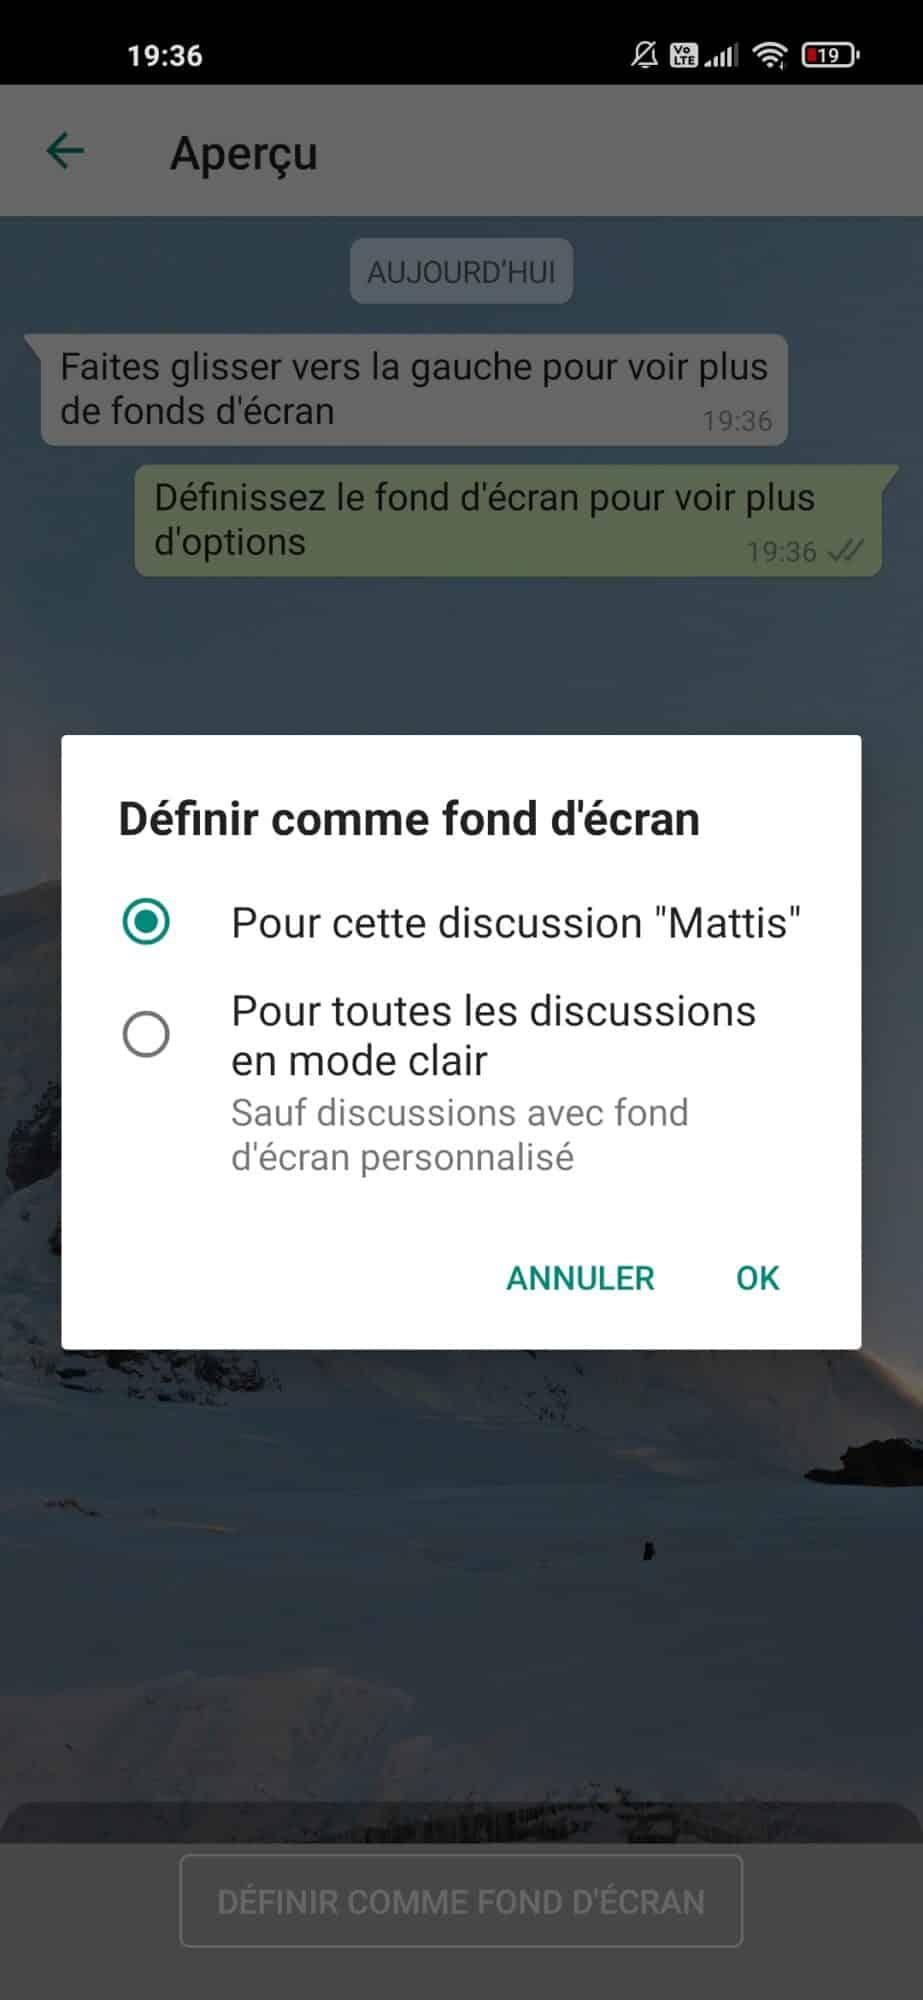 Signal WhatsApp, Signal met à jour son application : une copie de WhatsApp?